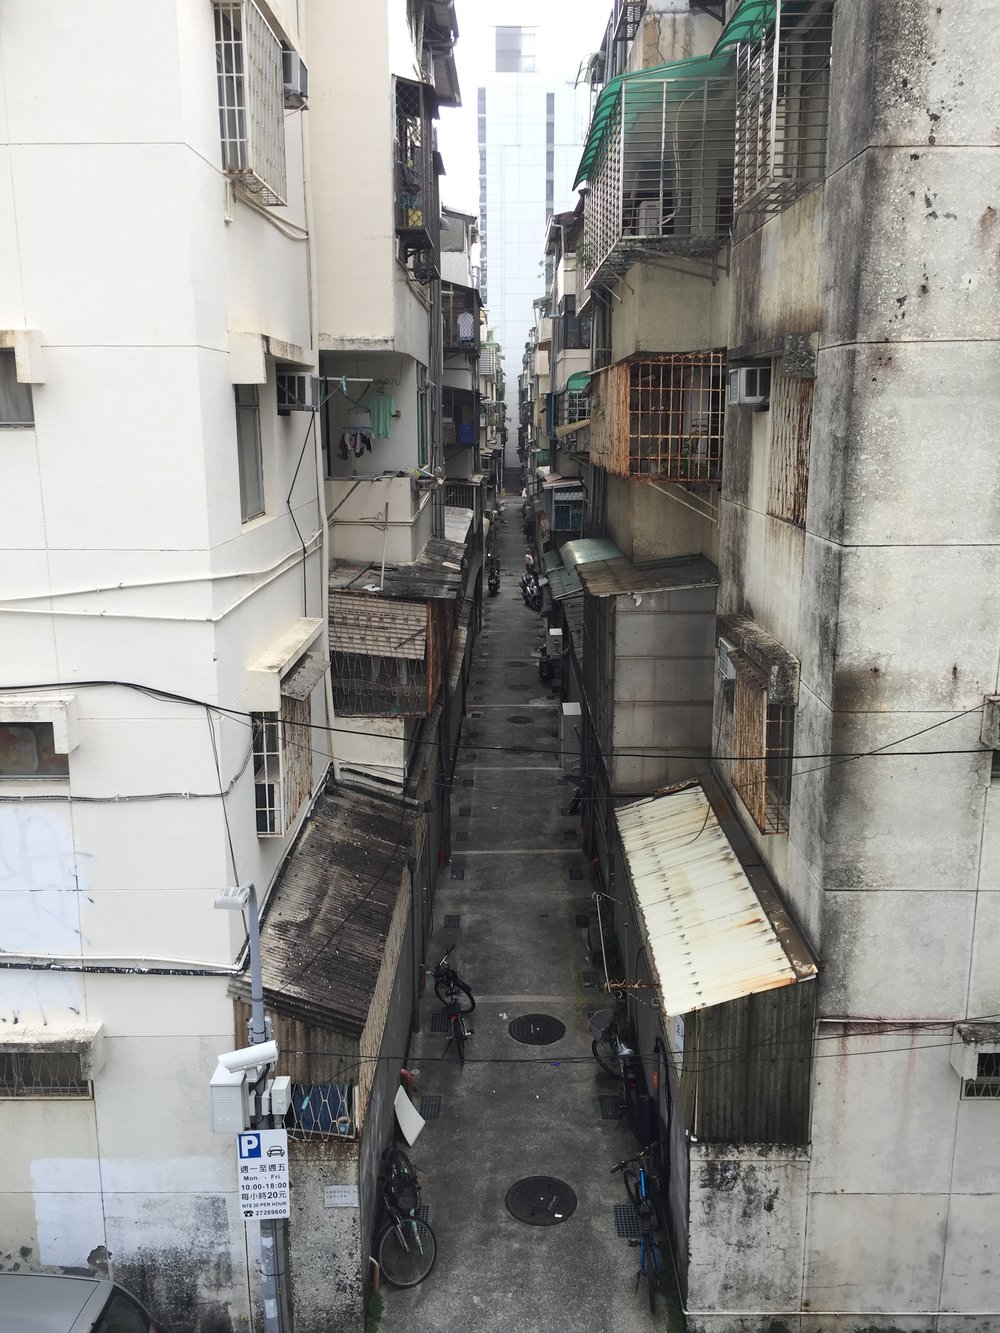 Zhongshan district, near Jiannan MRT. Nothing special. Just a normal residential Taiwanese street.